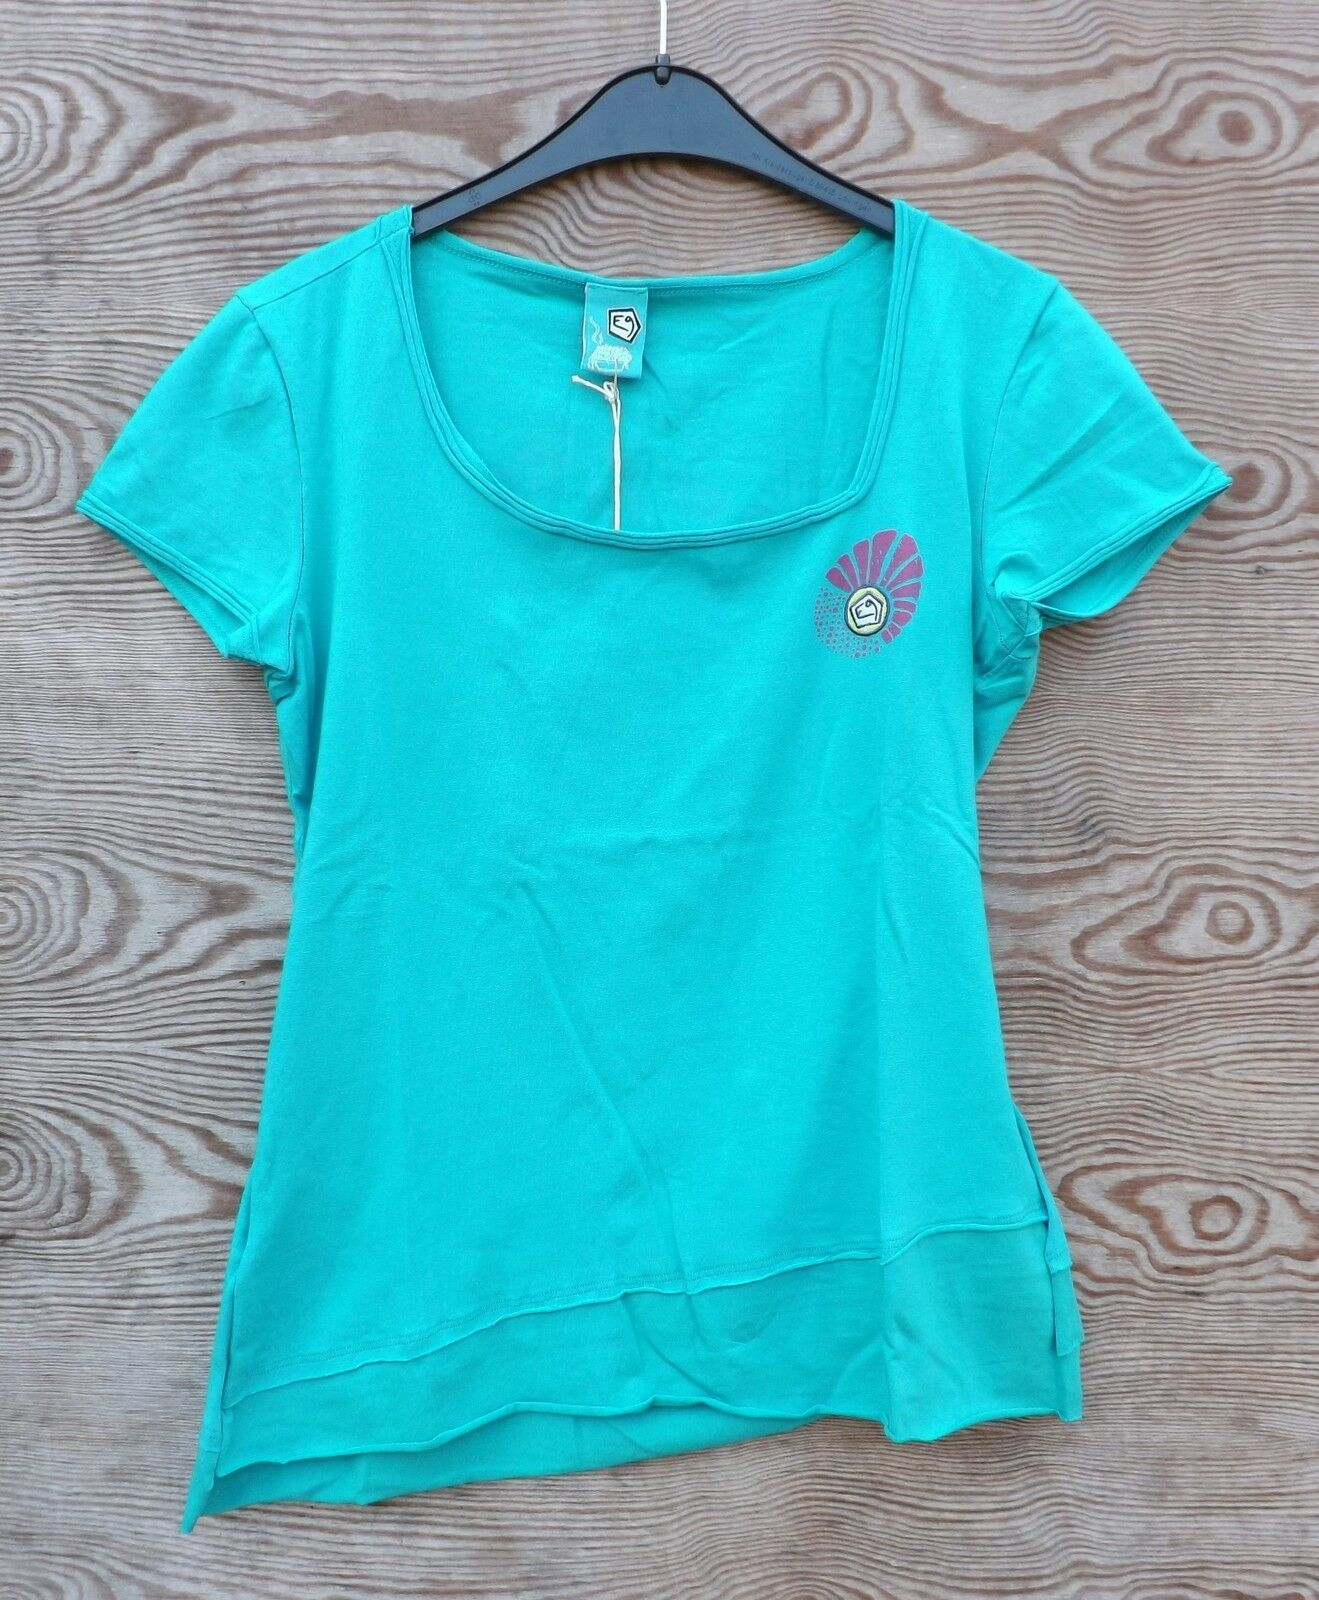 E9 NEW Start, T-Shirt for Ladies, Mint,  Size XS  good reputation